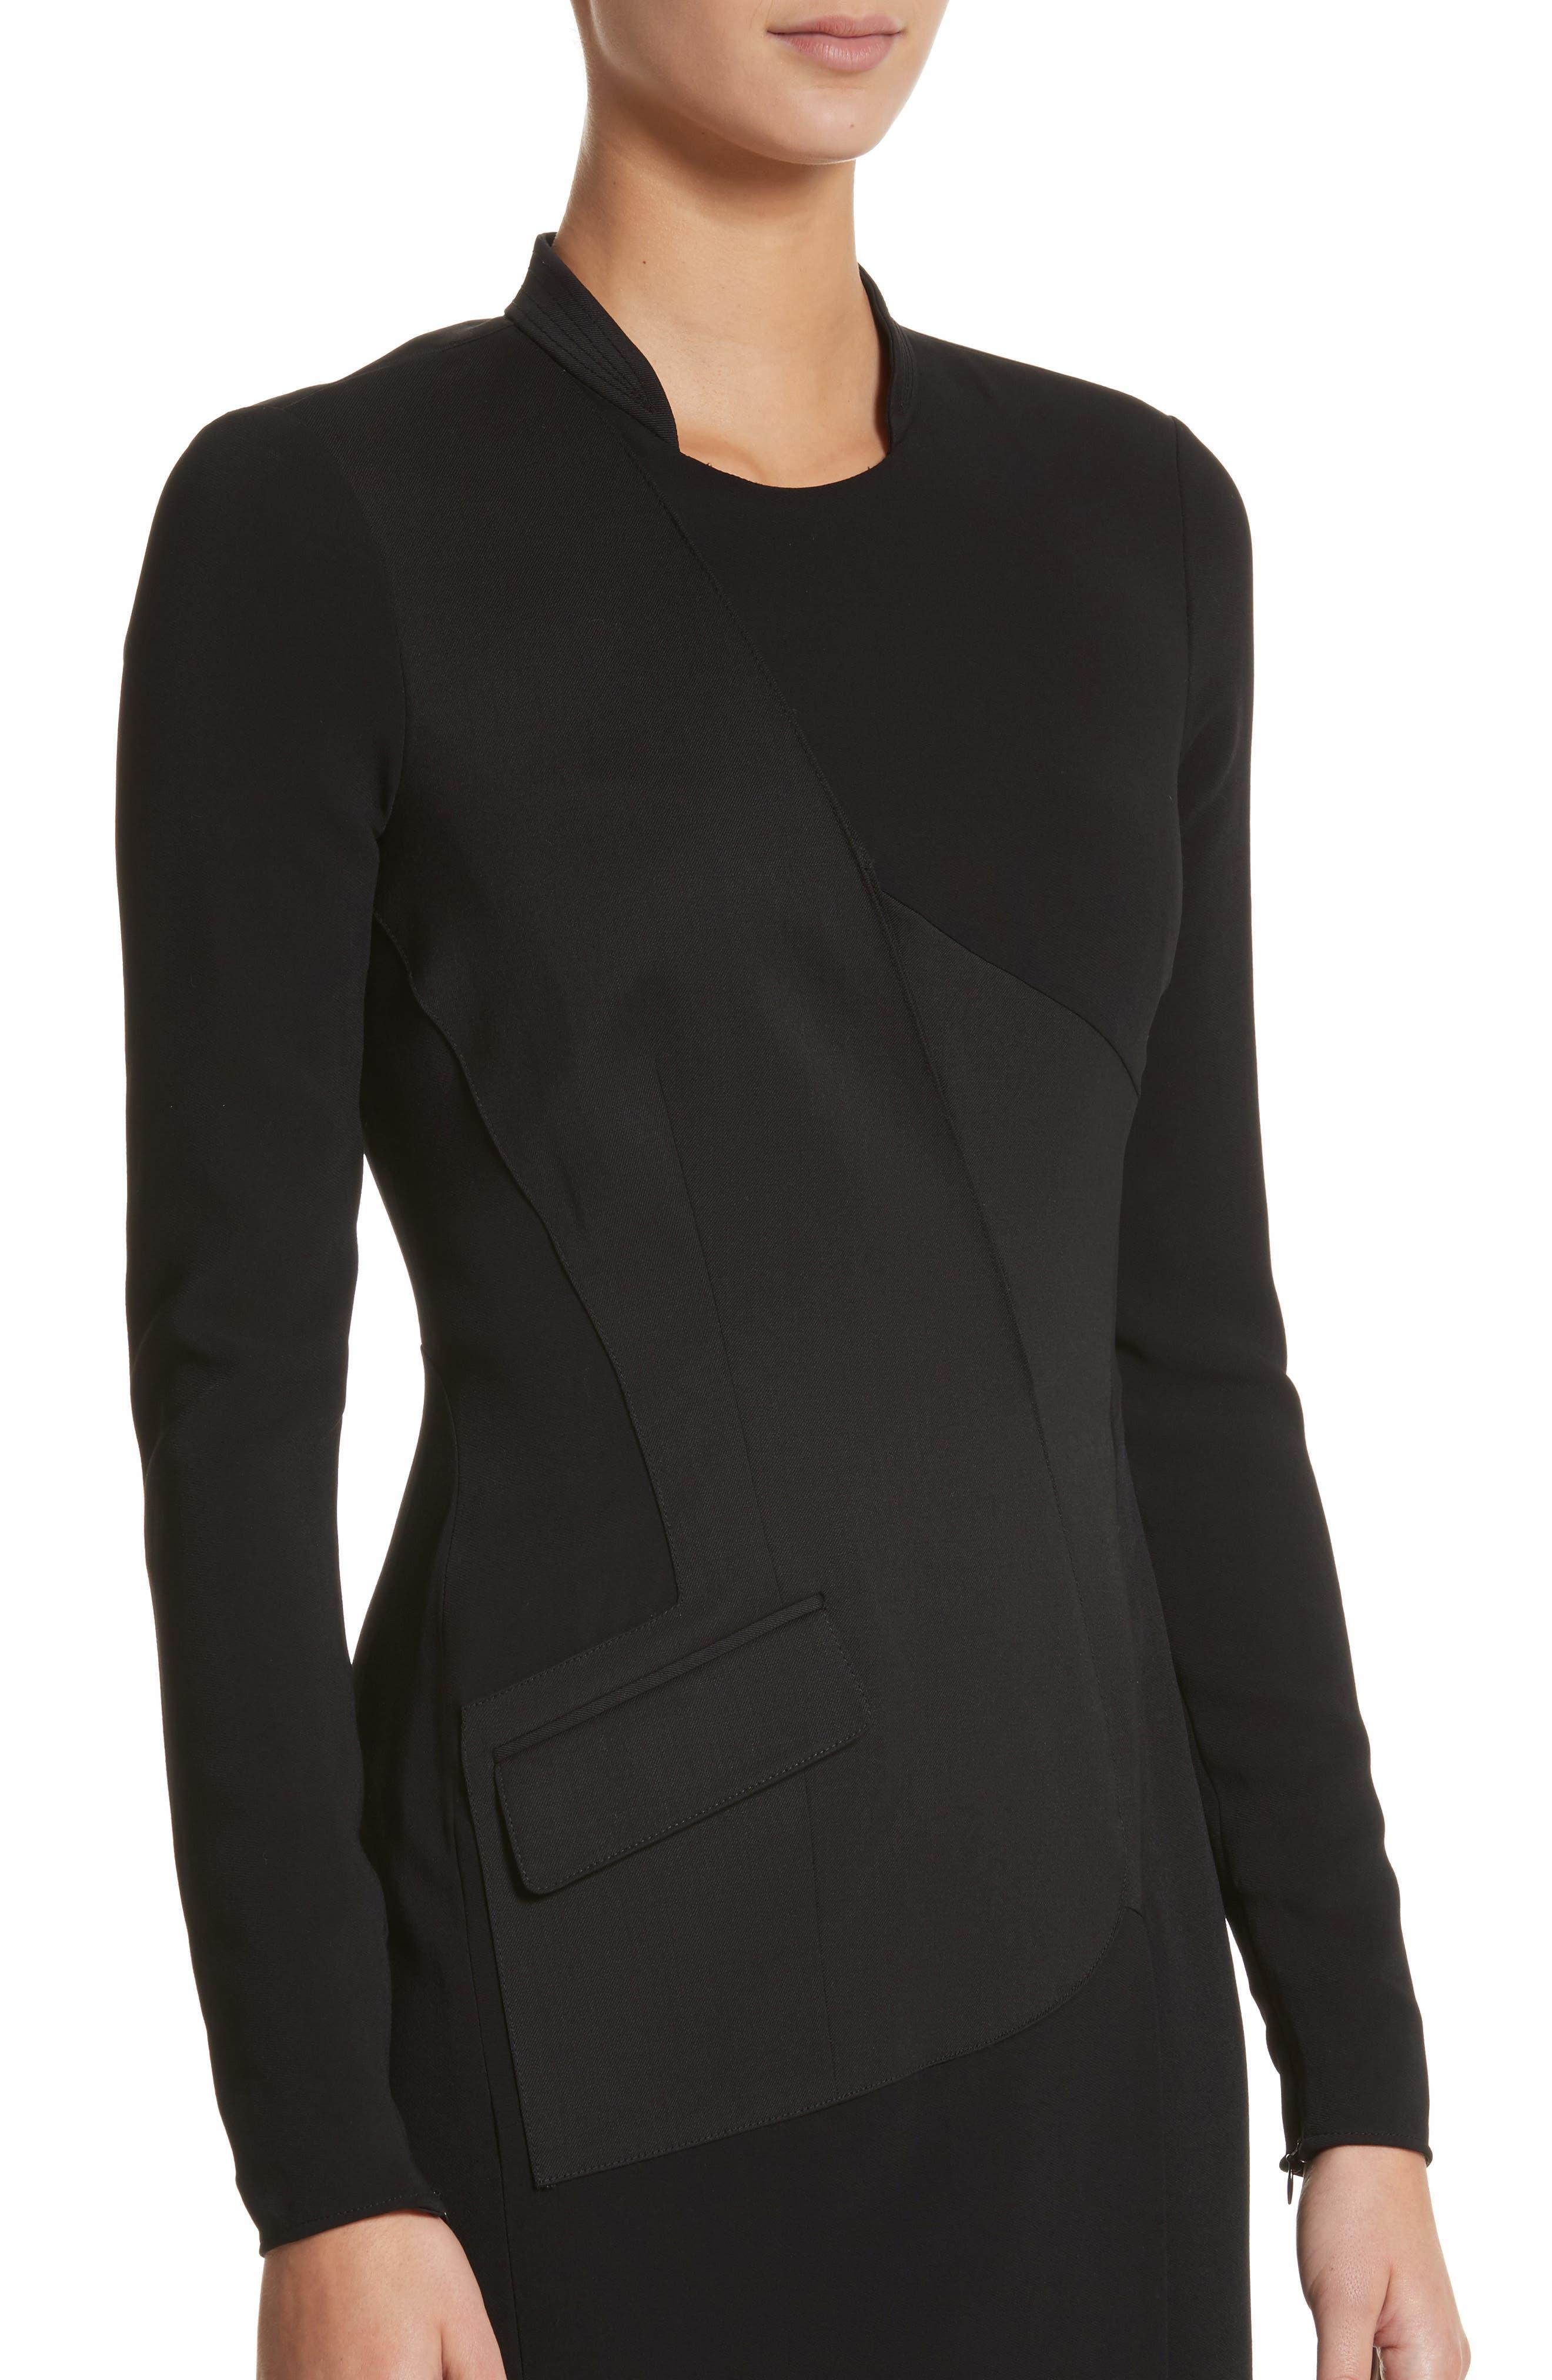 Miriam Sheath Dress,                             Alternate thumbnail 4, color,                             Black